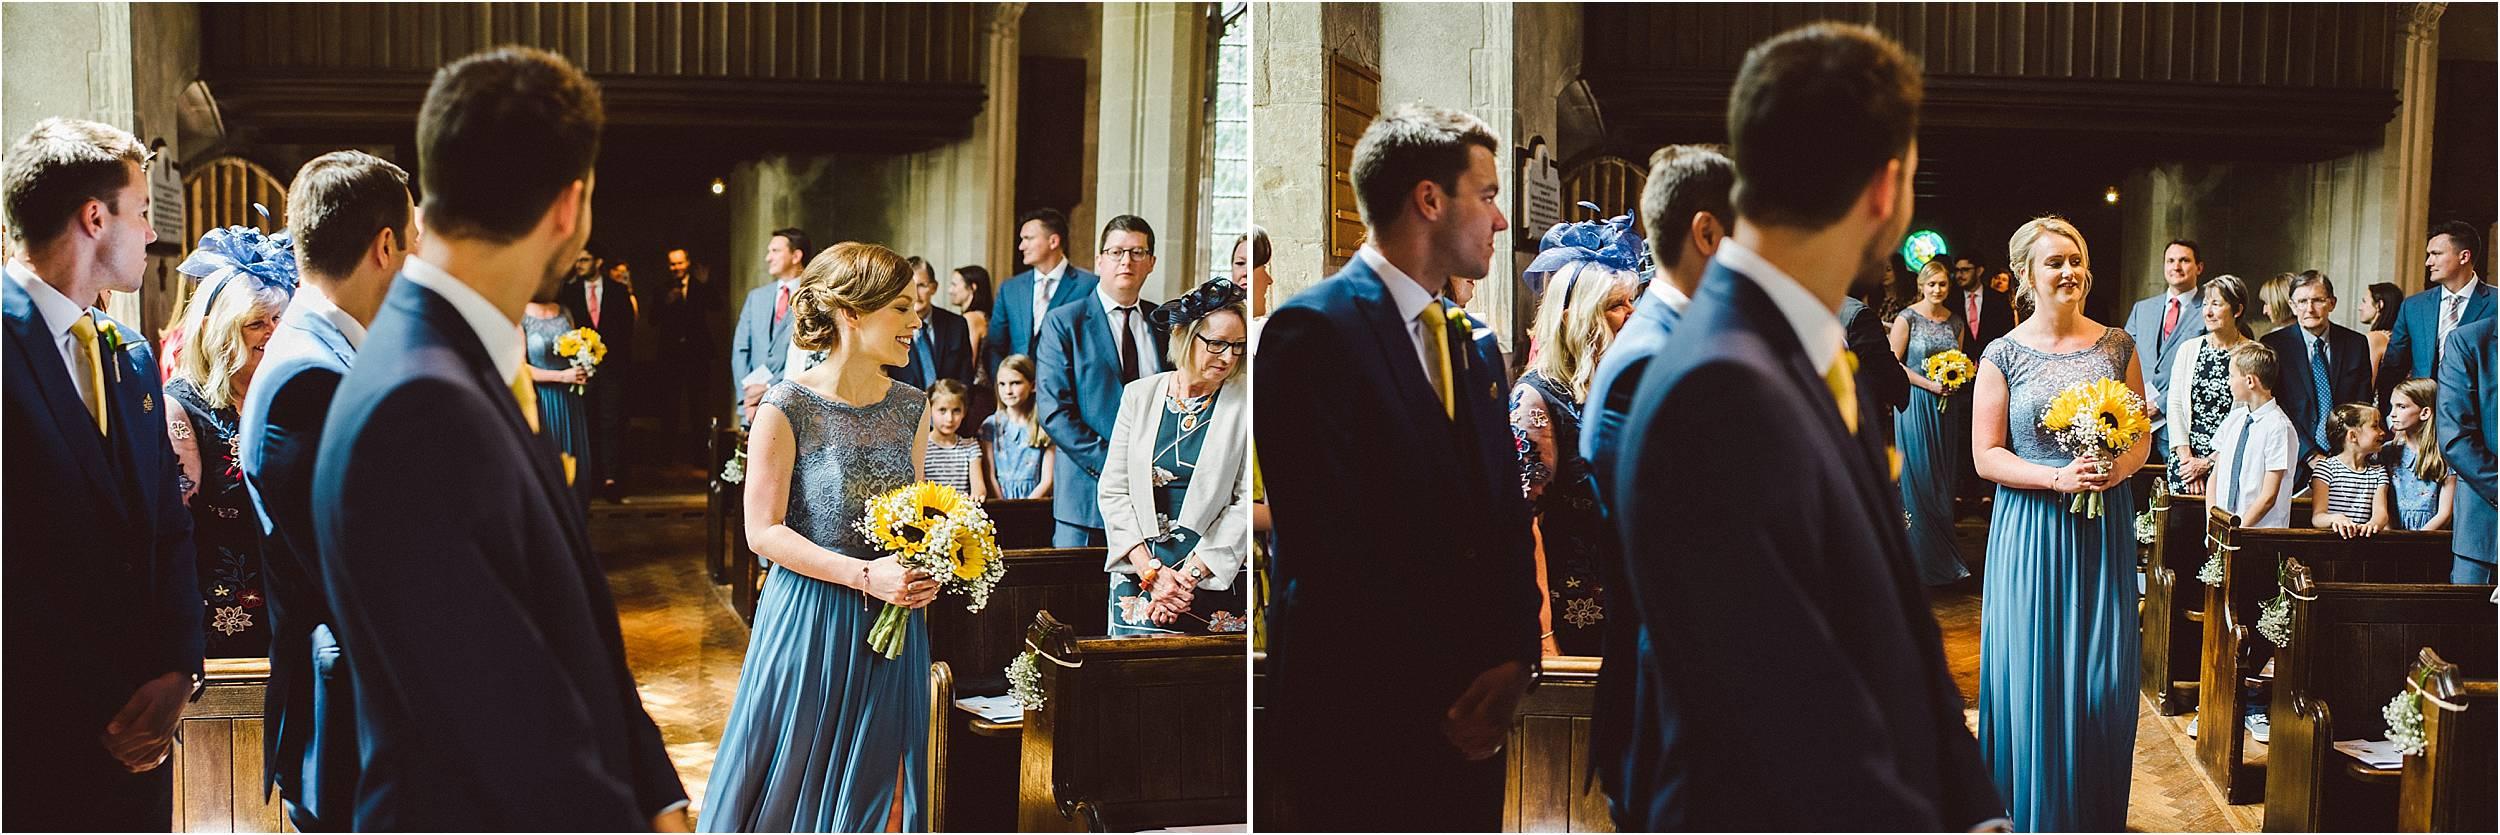 Hengrave Hall Wedding Photographer_0091.jpg